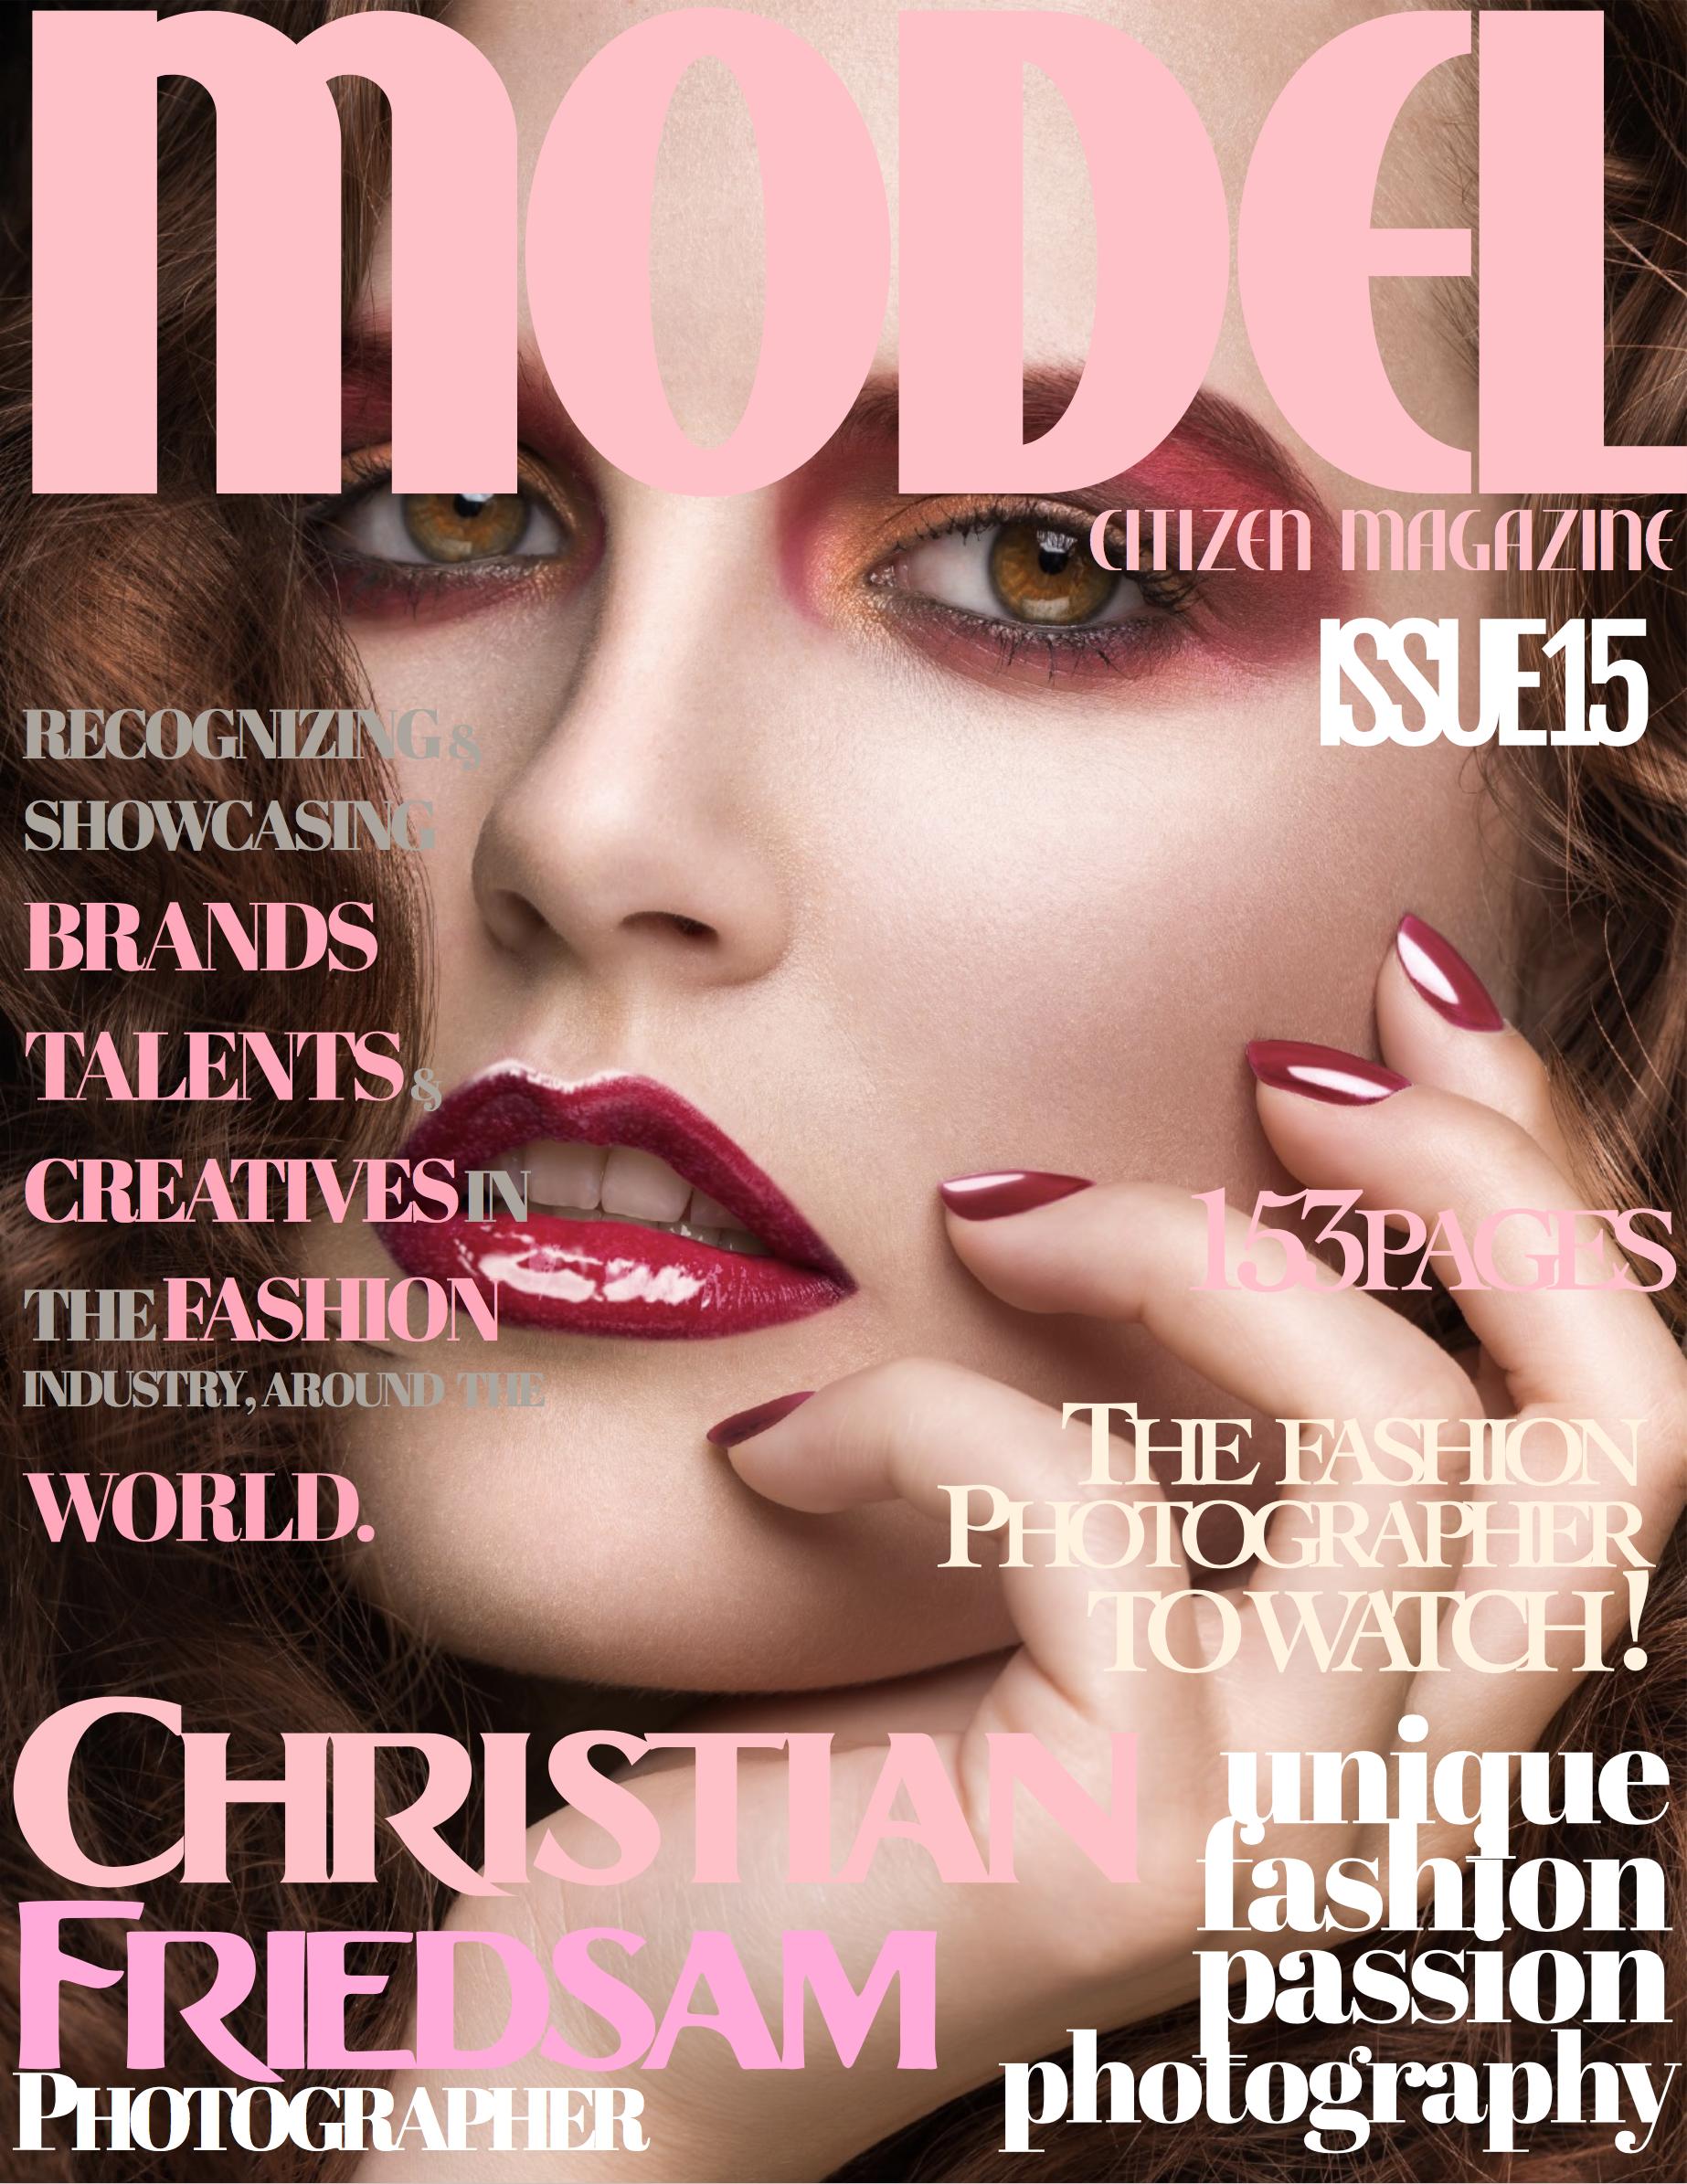 Model Citizen Magazine Reviews, Model Citizen Media, Best Fashion Magazine, Macky Suson, List of Fashion Magazine, Model Citizen Magazine Issue 15